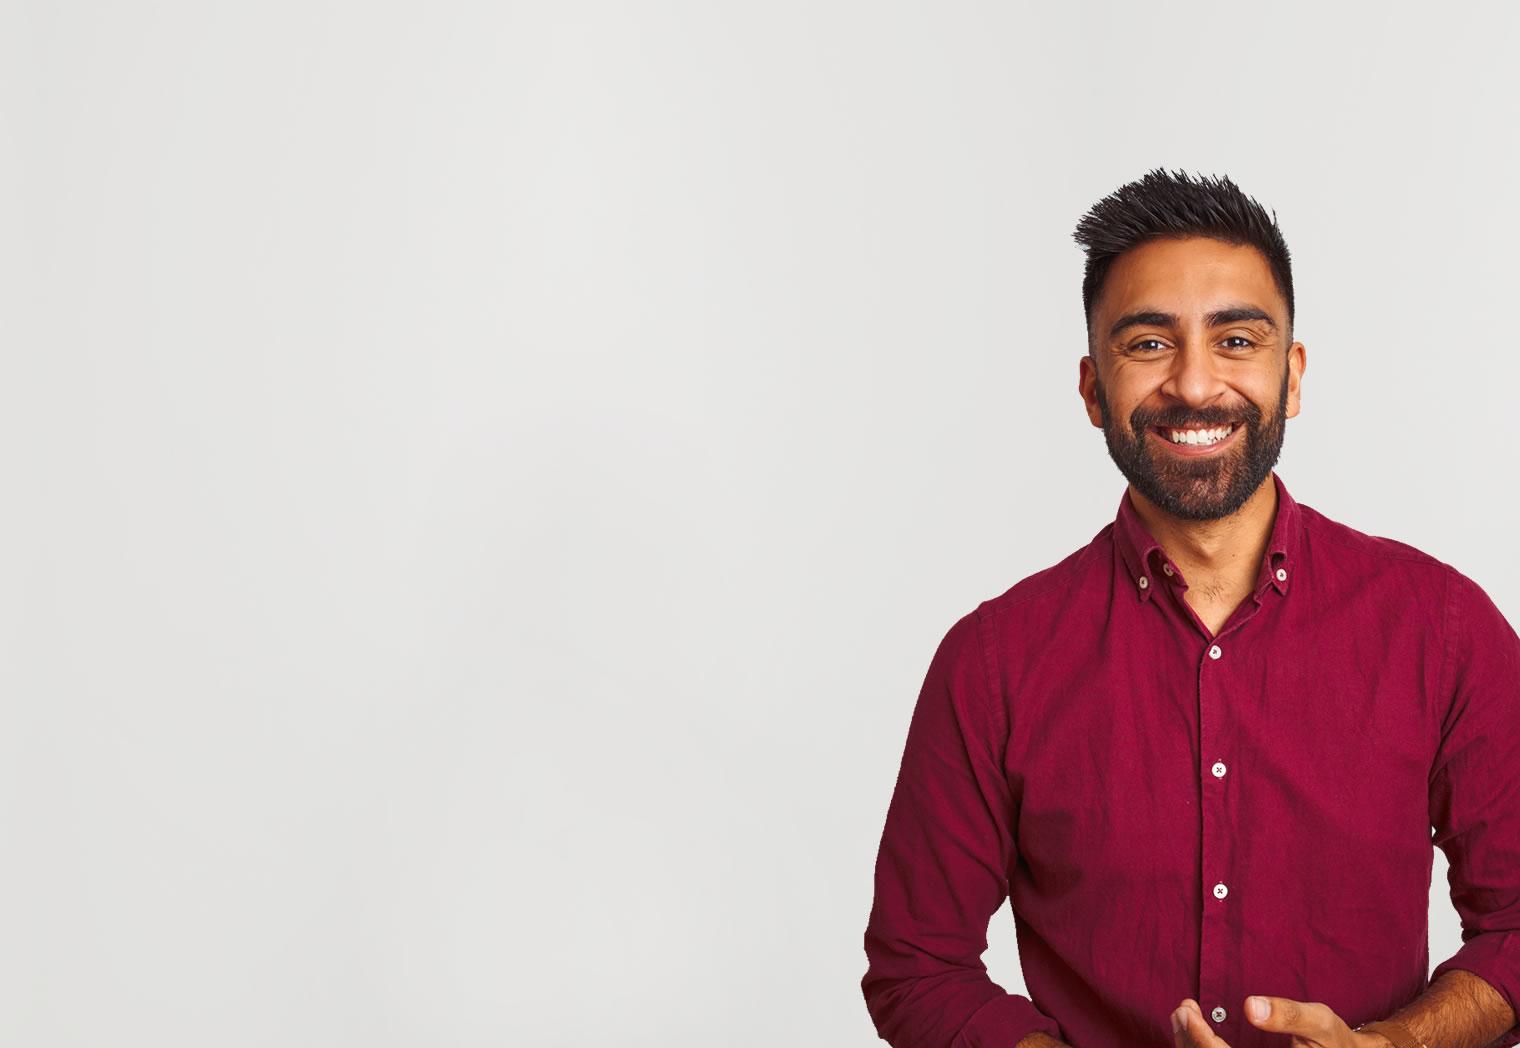 Smiling portrait of a man